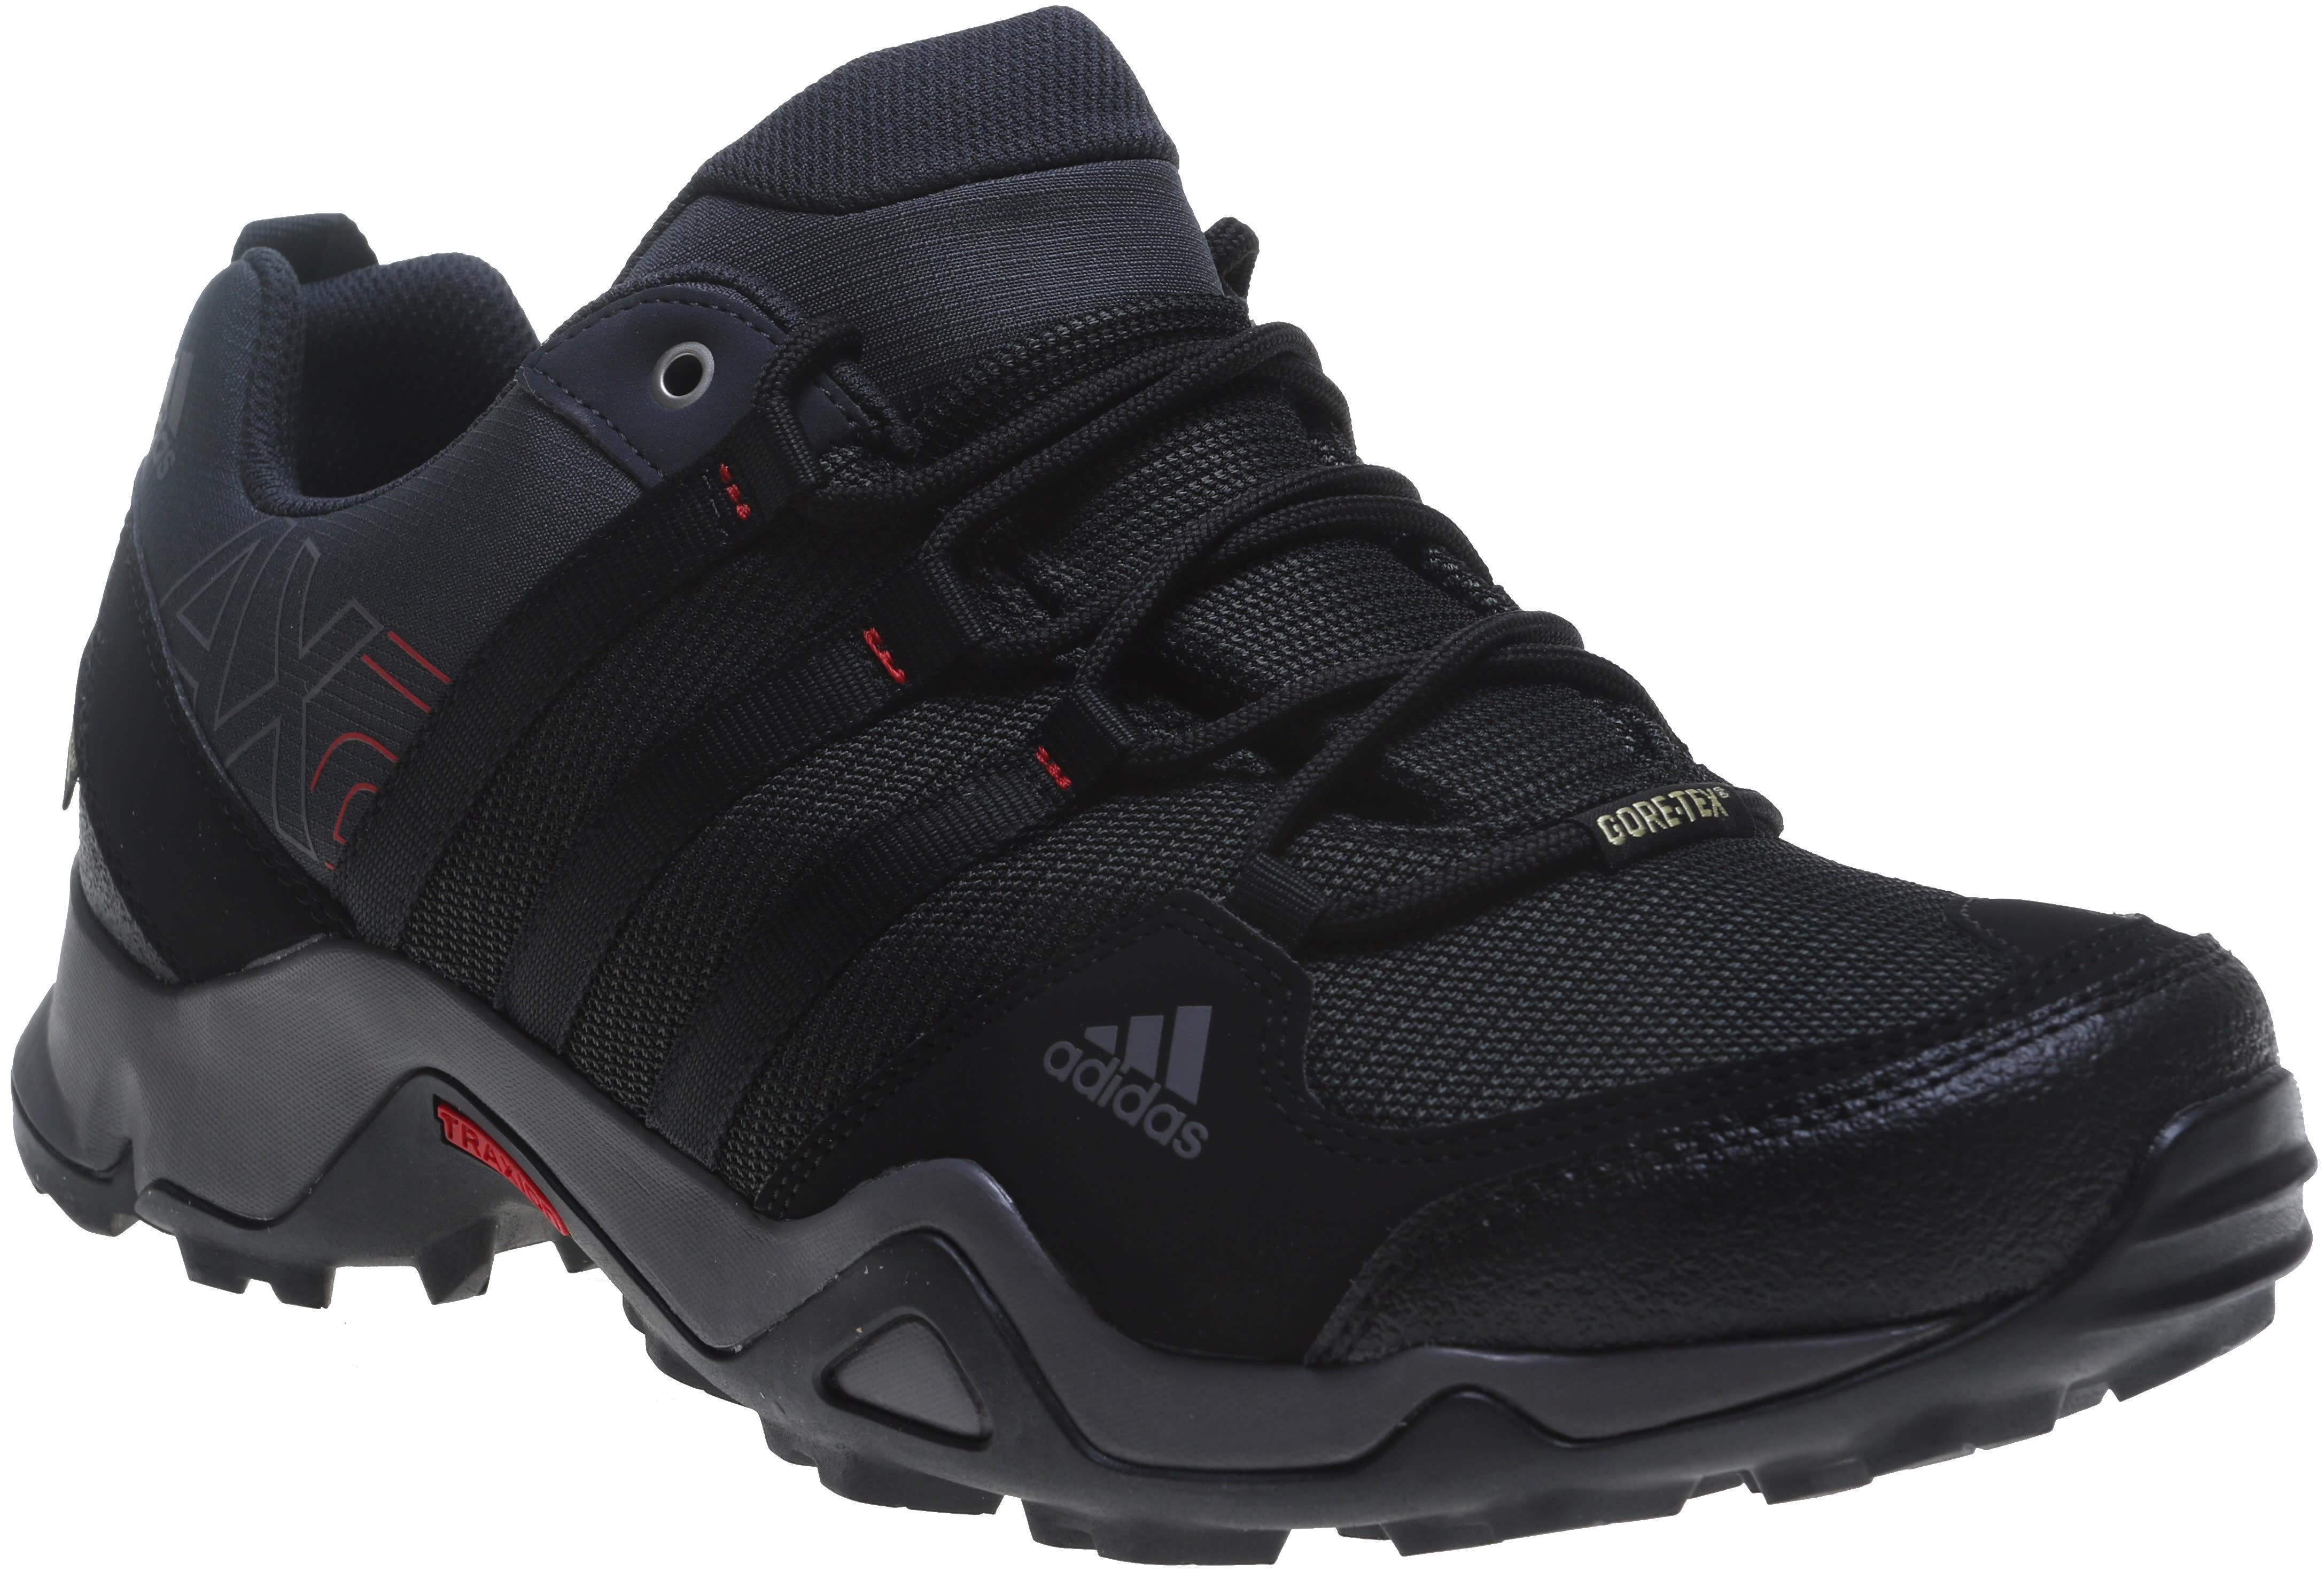 Adidas Ax2 Gore Tex Hiking Shoes